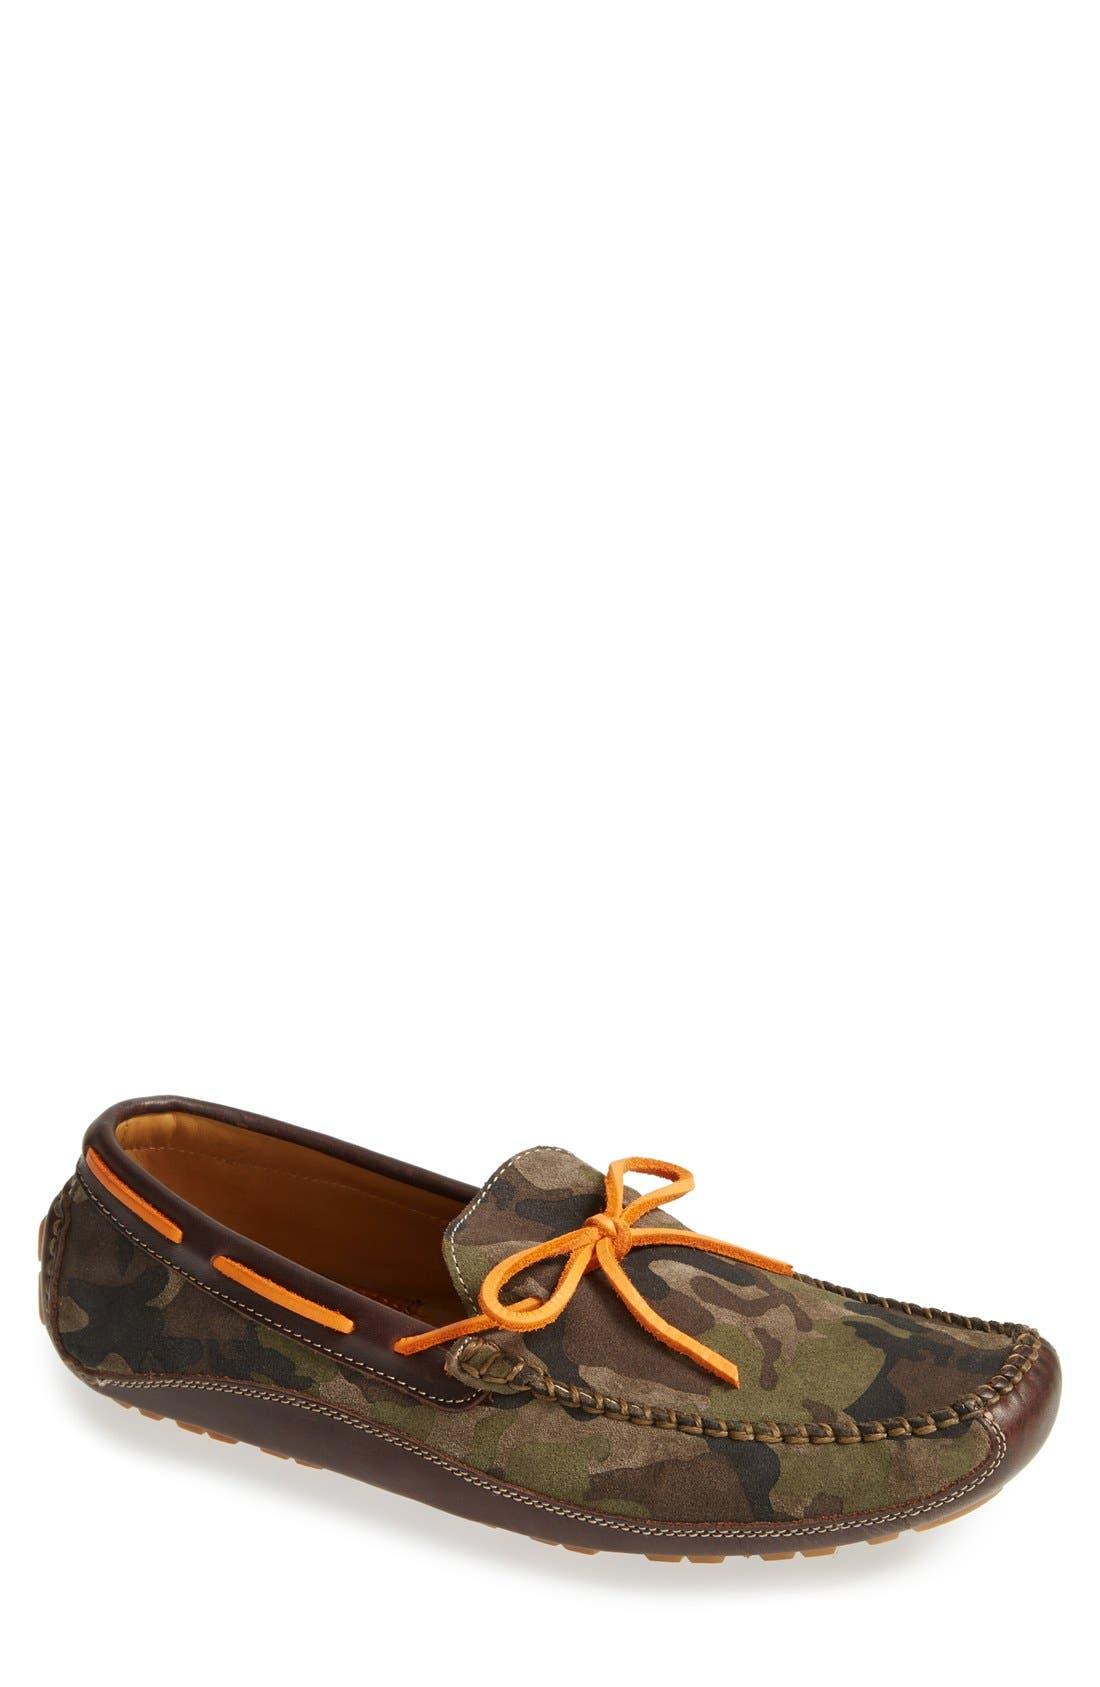 'Drake' Leather Driving Shoe,                             Main thumbnail 2, color,